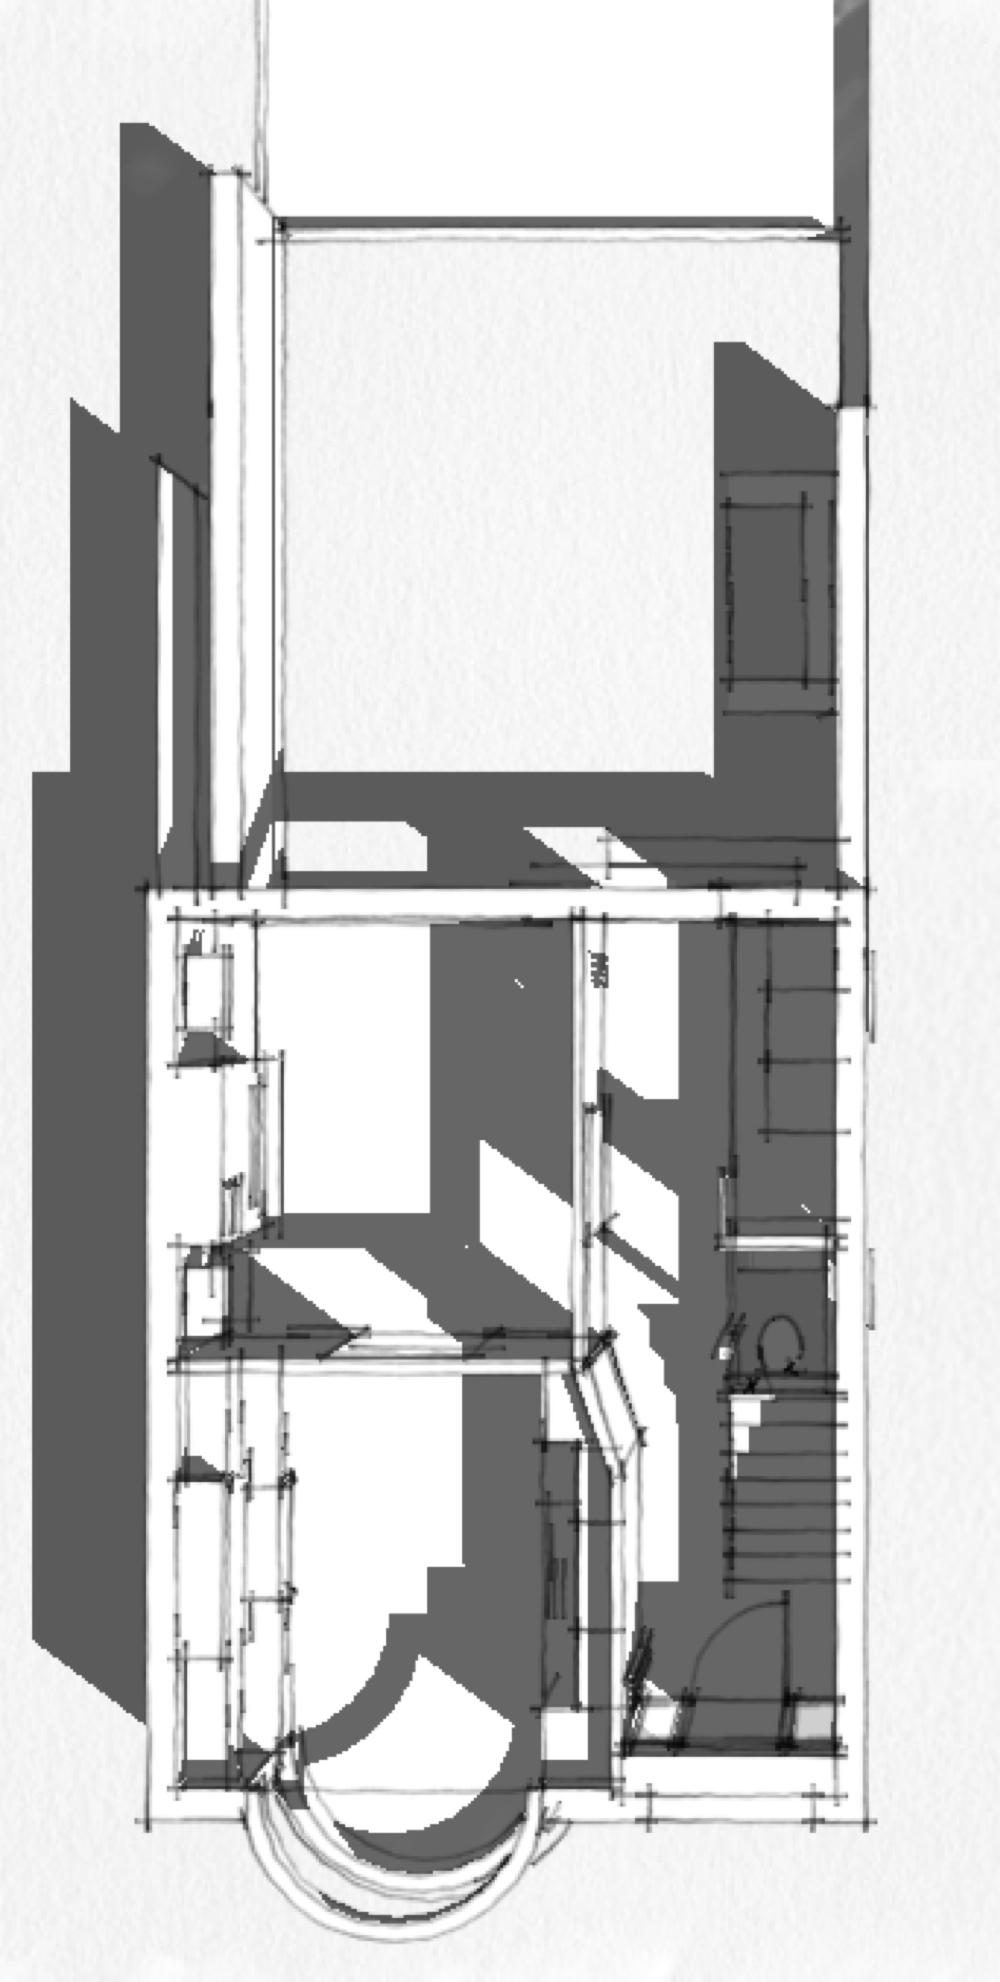 1930's - 3 bed semi internal remodel